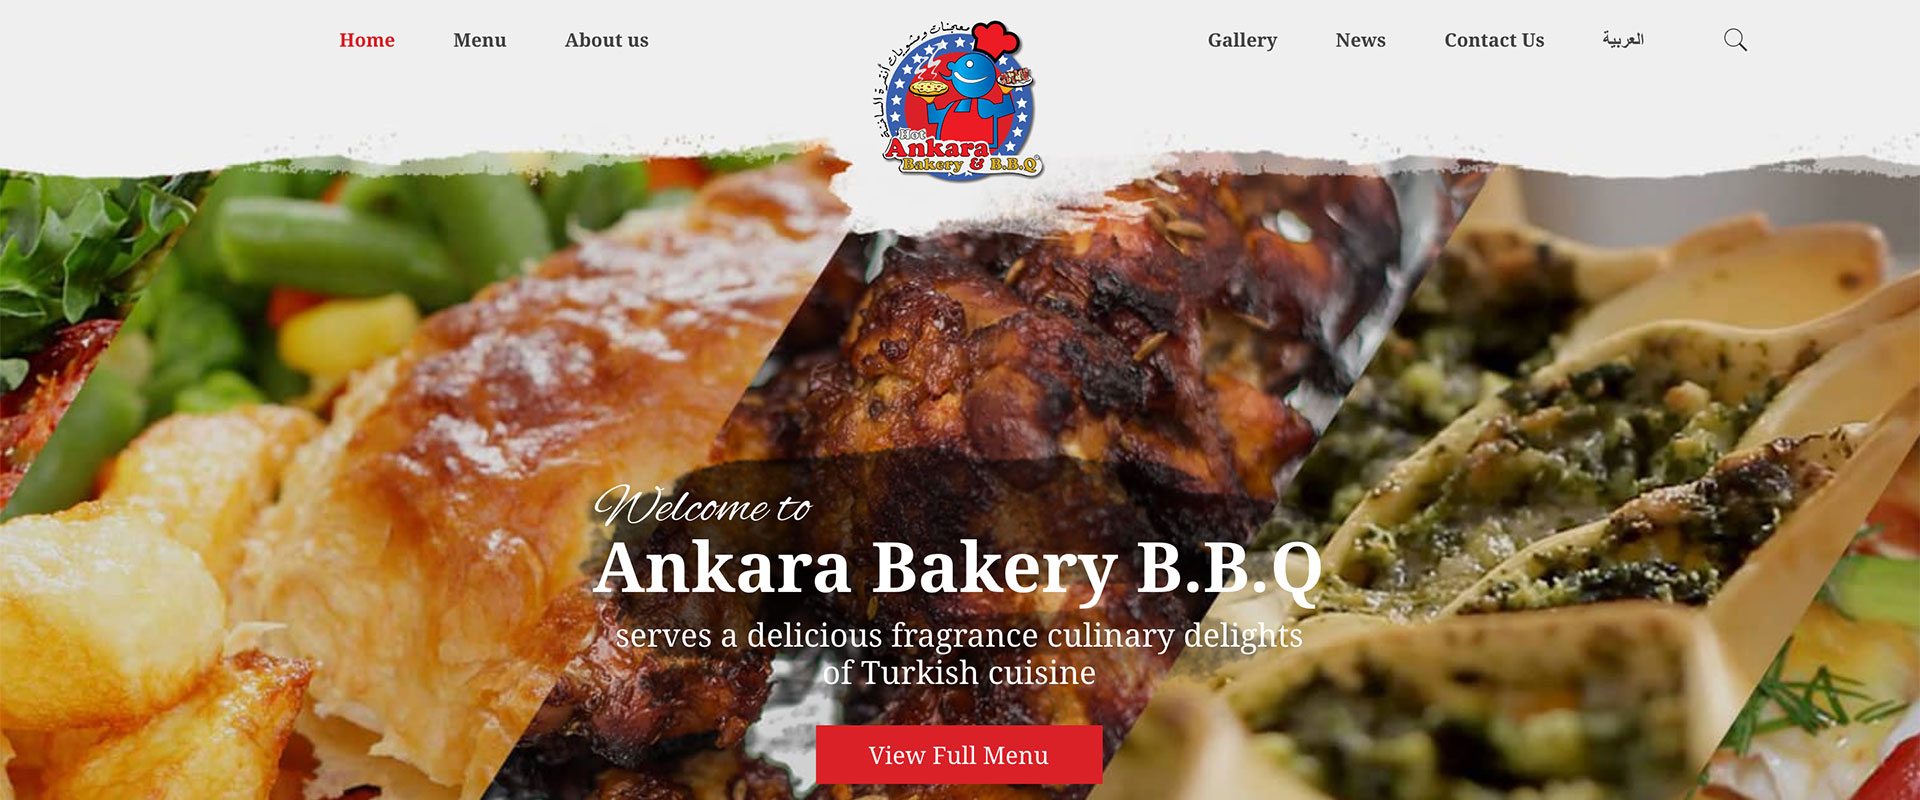 Hot Ankara Bakery & BBQ Qatar